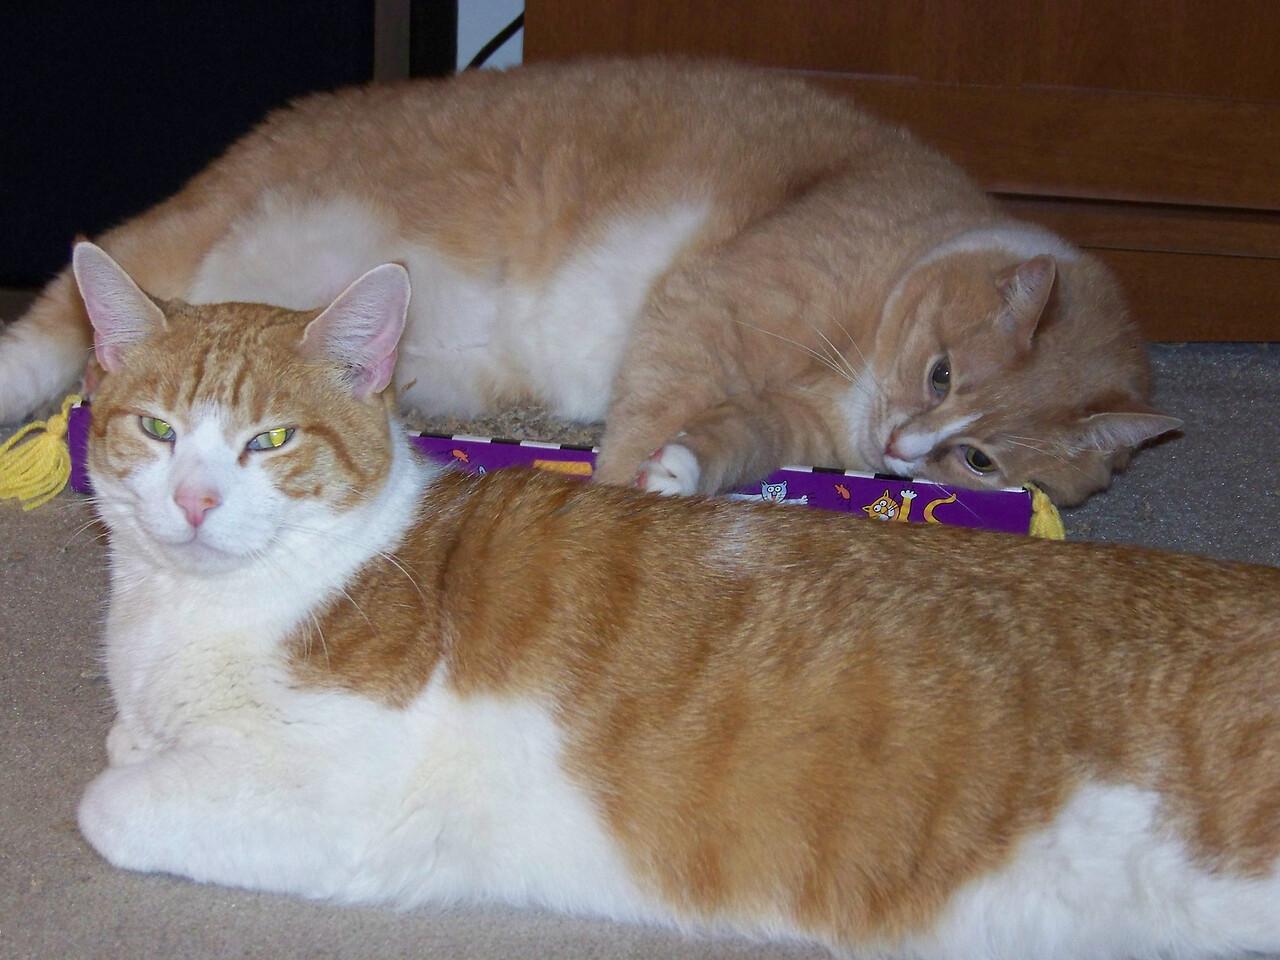 Stan & Ollie (taken with flash).  October 2009.